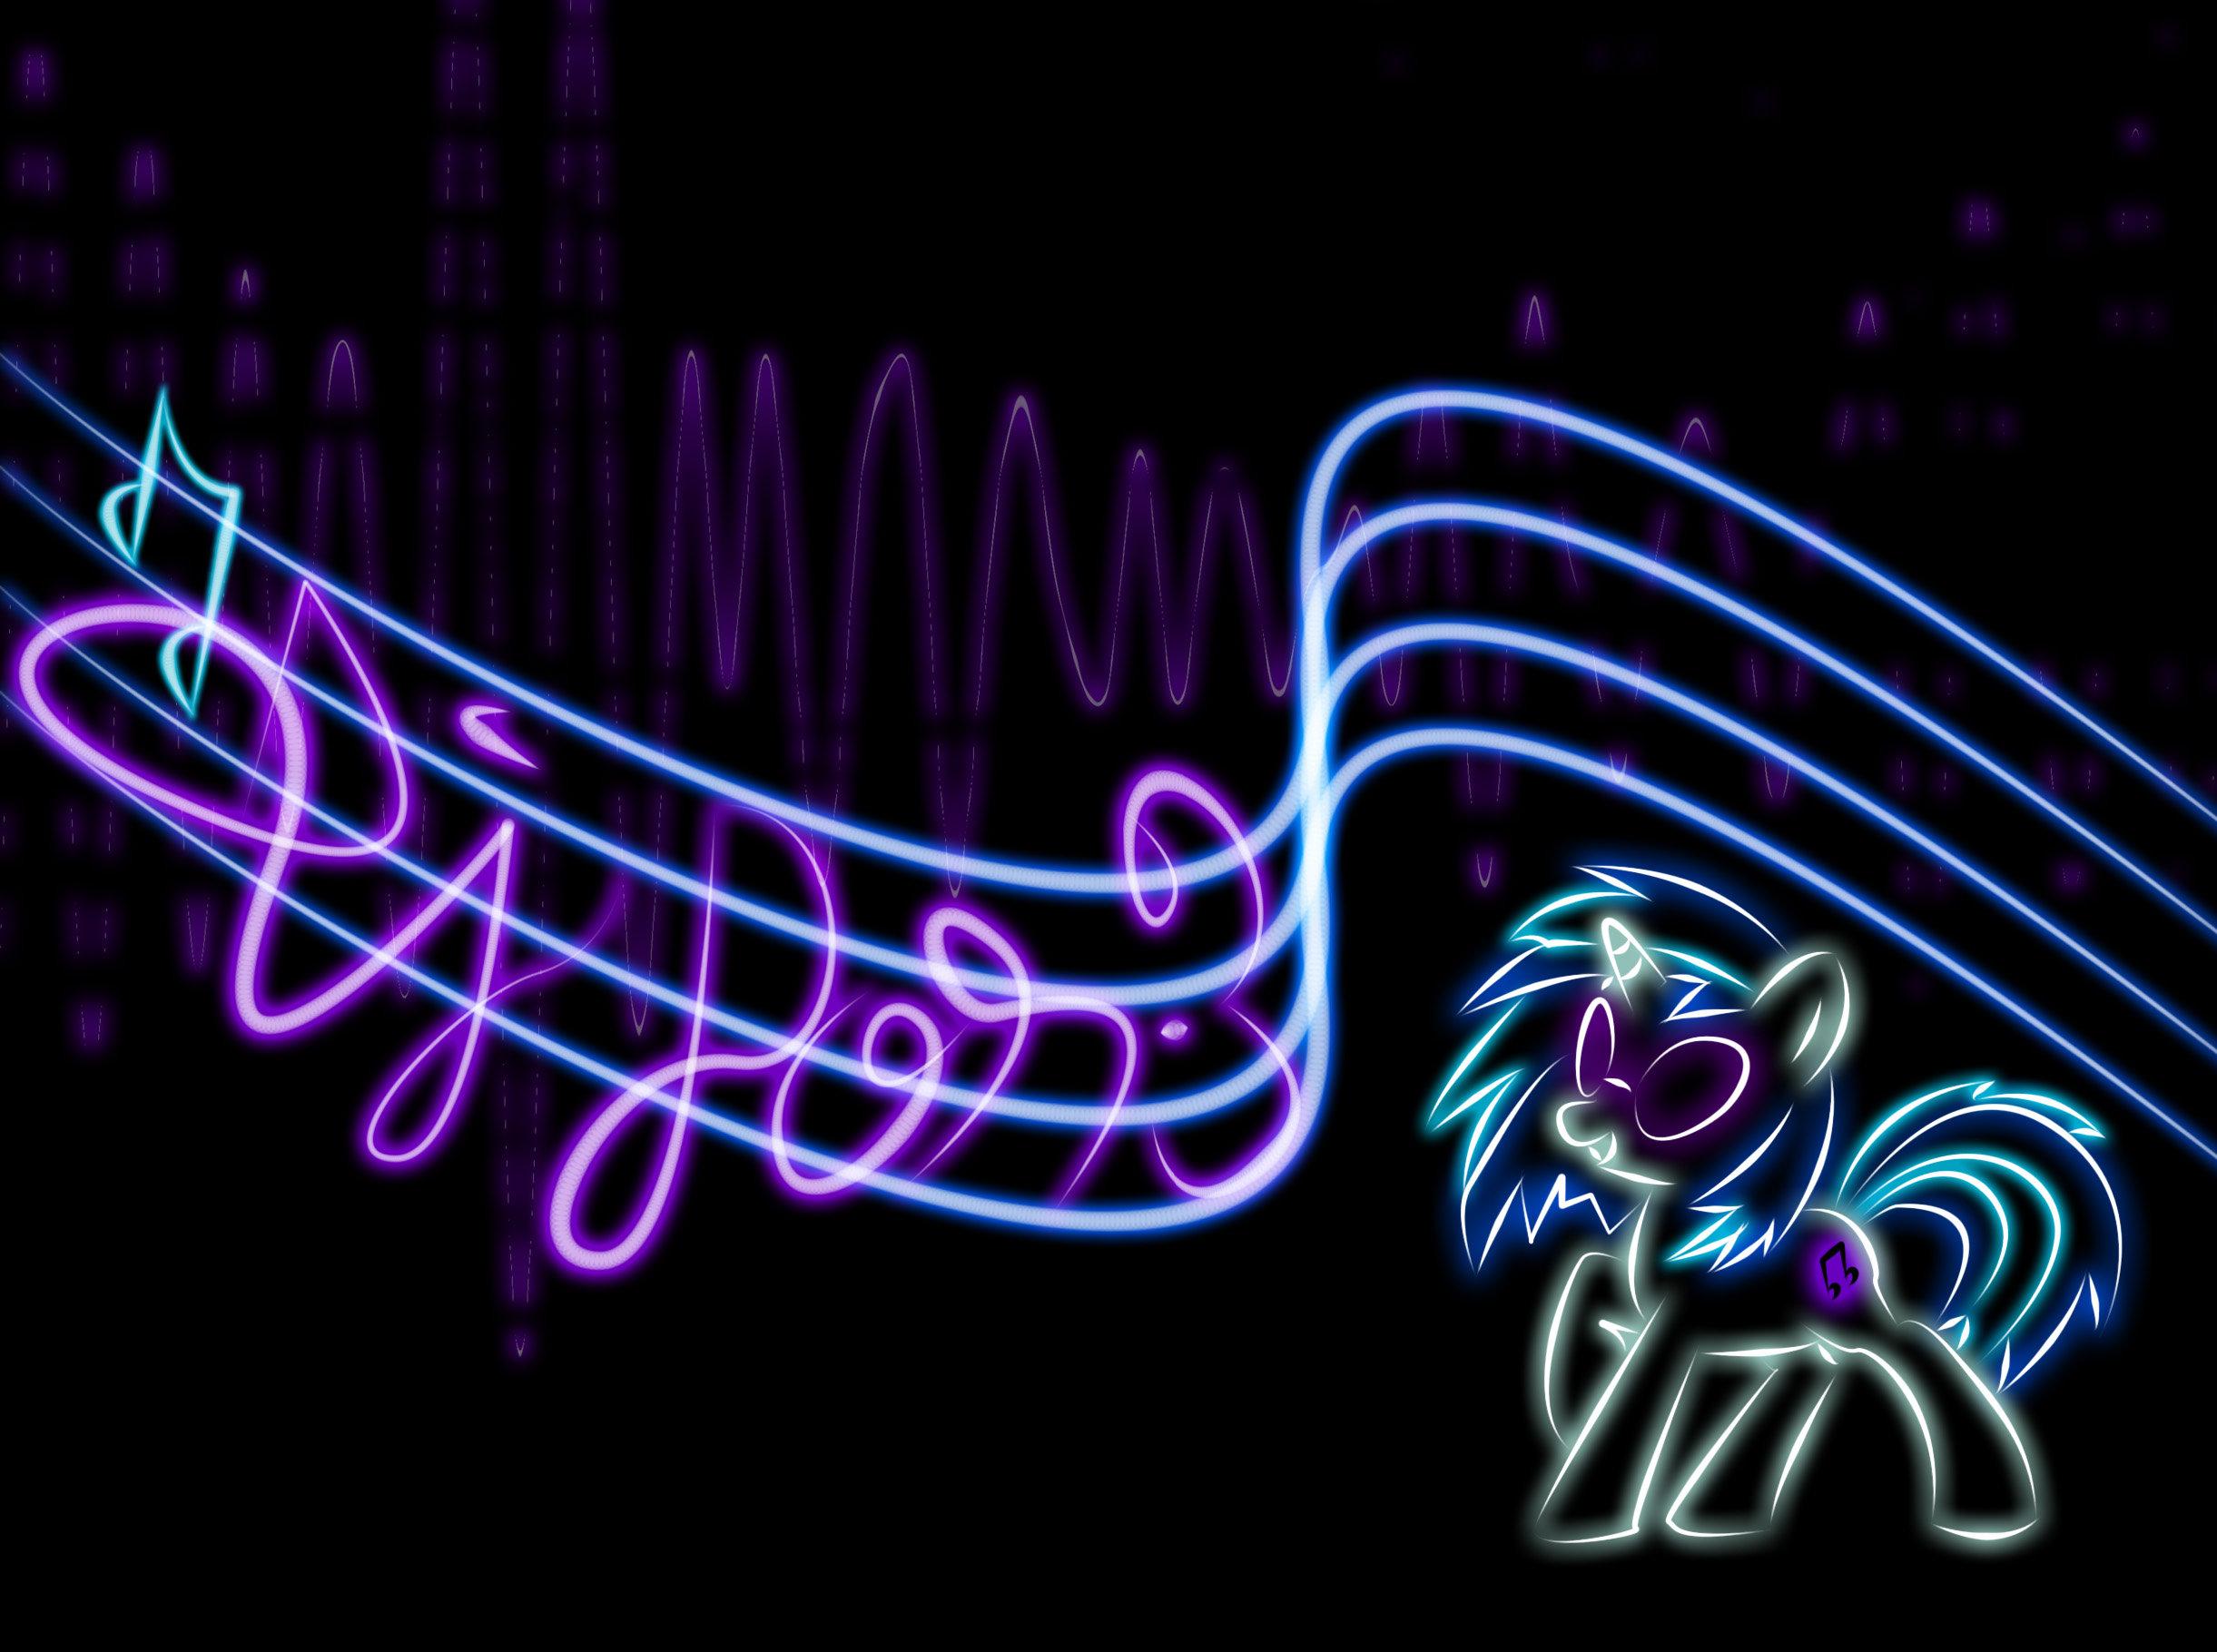 DJ Pon-3 Wallpaper by buckheadgar